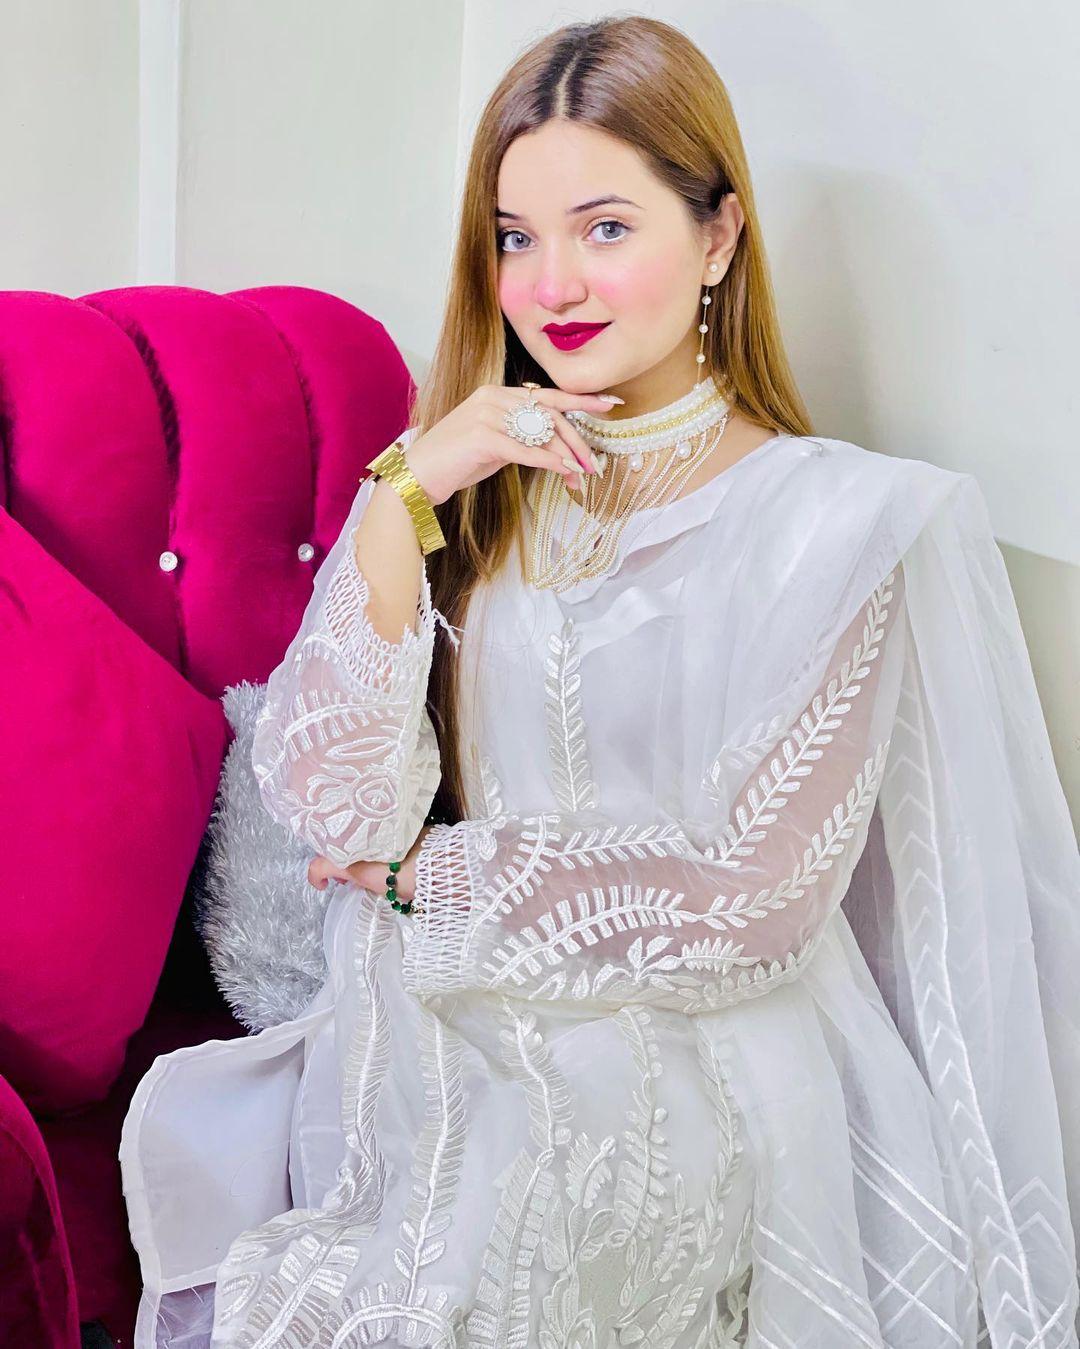 Rabeeca Khan Pakistani TikToker viral scandal videos